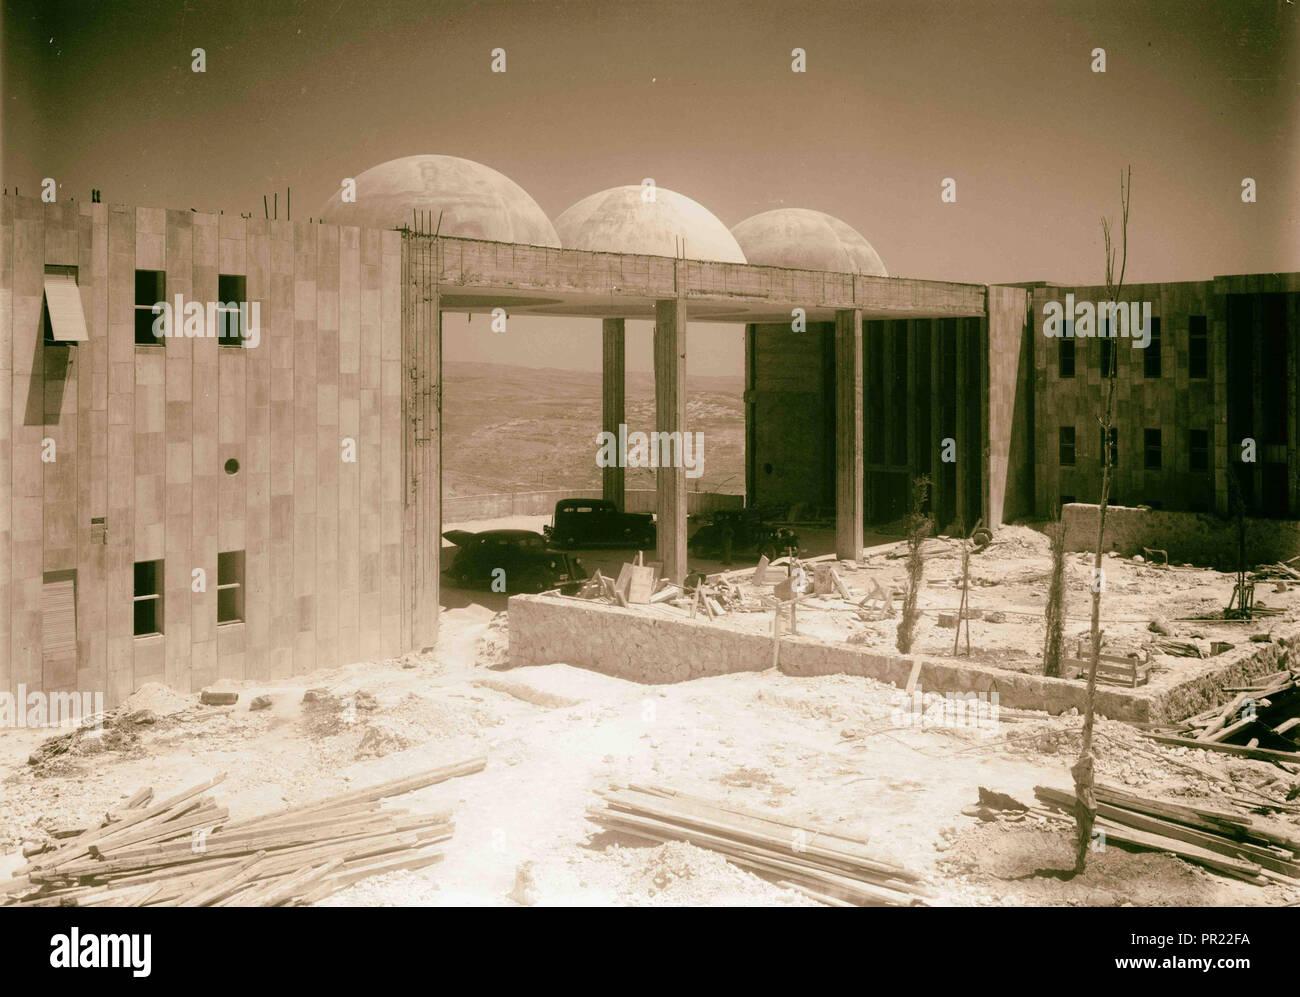 Hadassah University on Scopus  Courtyard between maternity